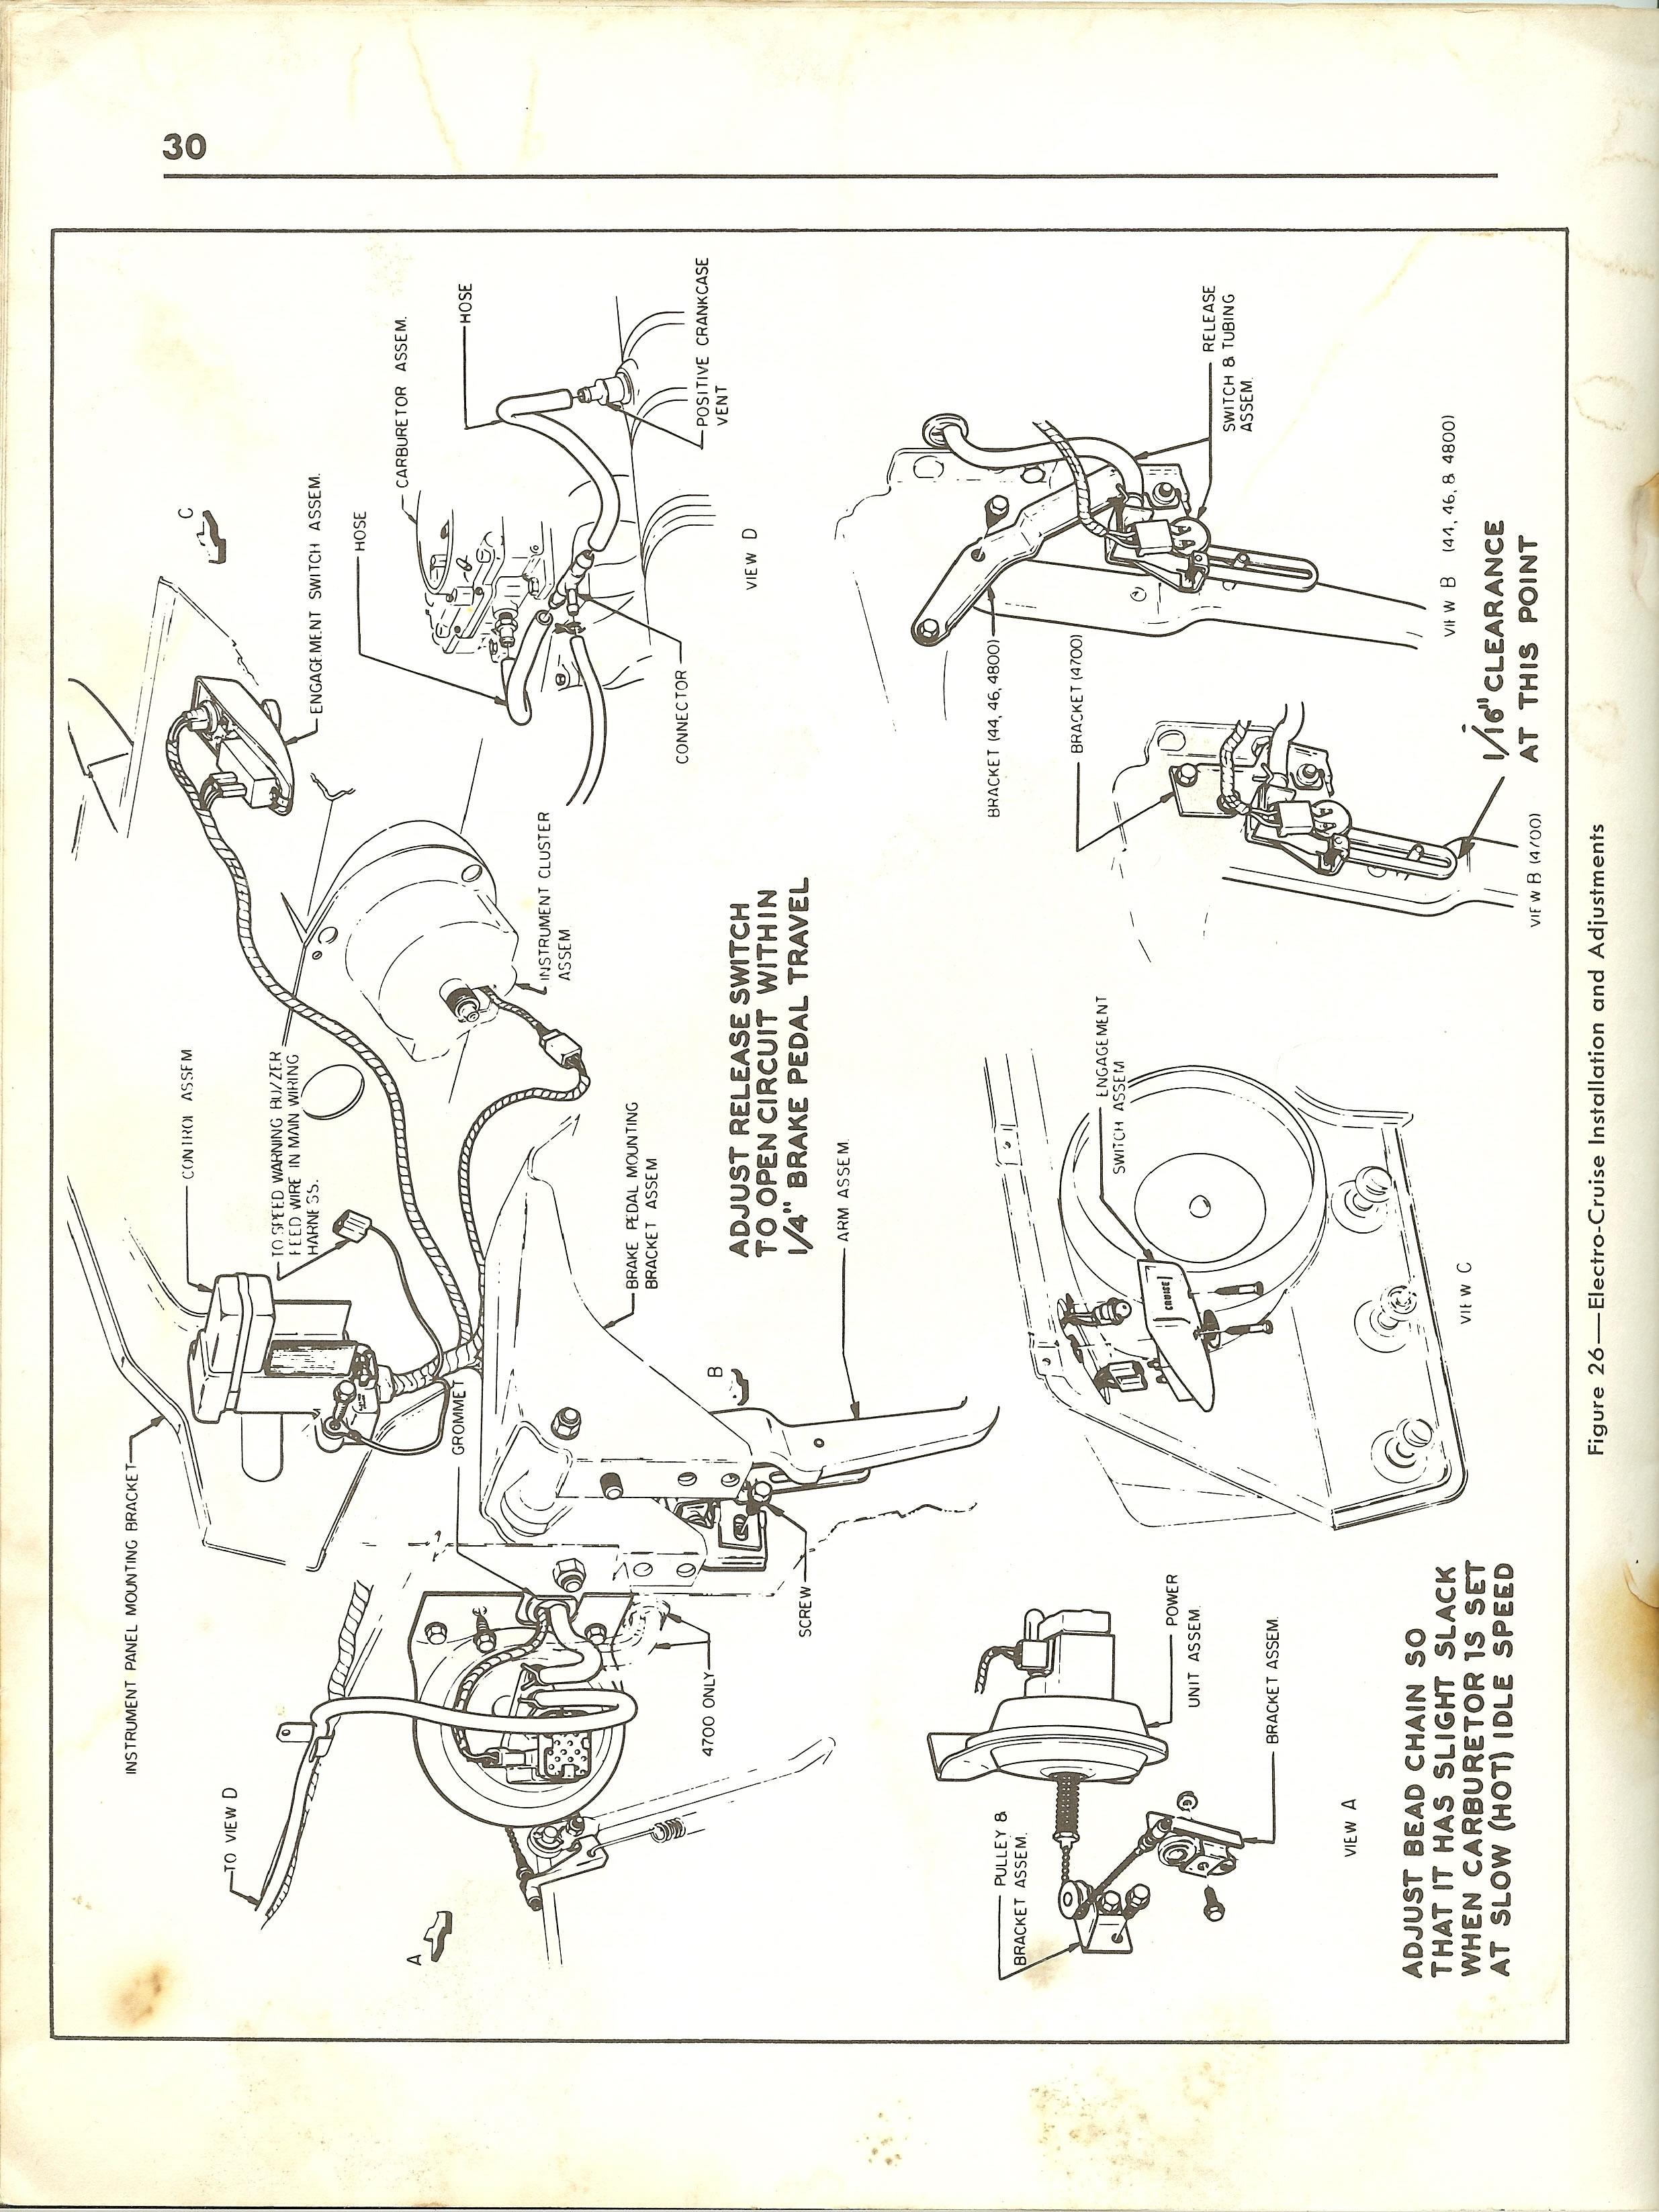 1963 Buick Preliminary Service Information/buickprelimsvc_030.jpg